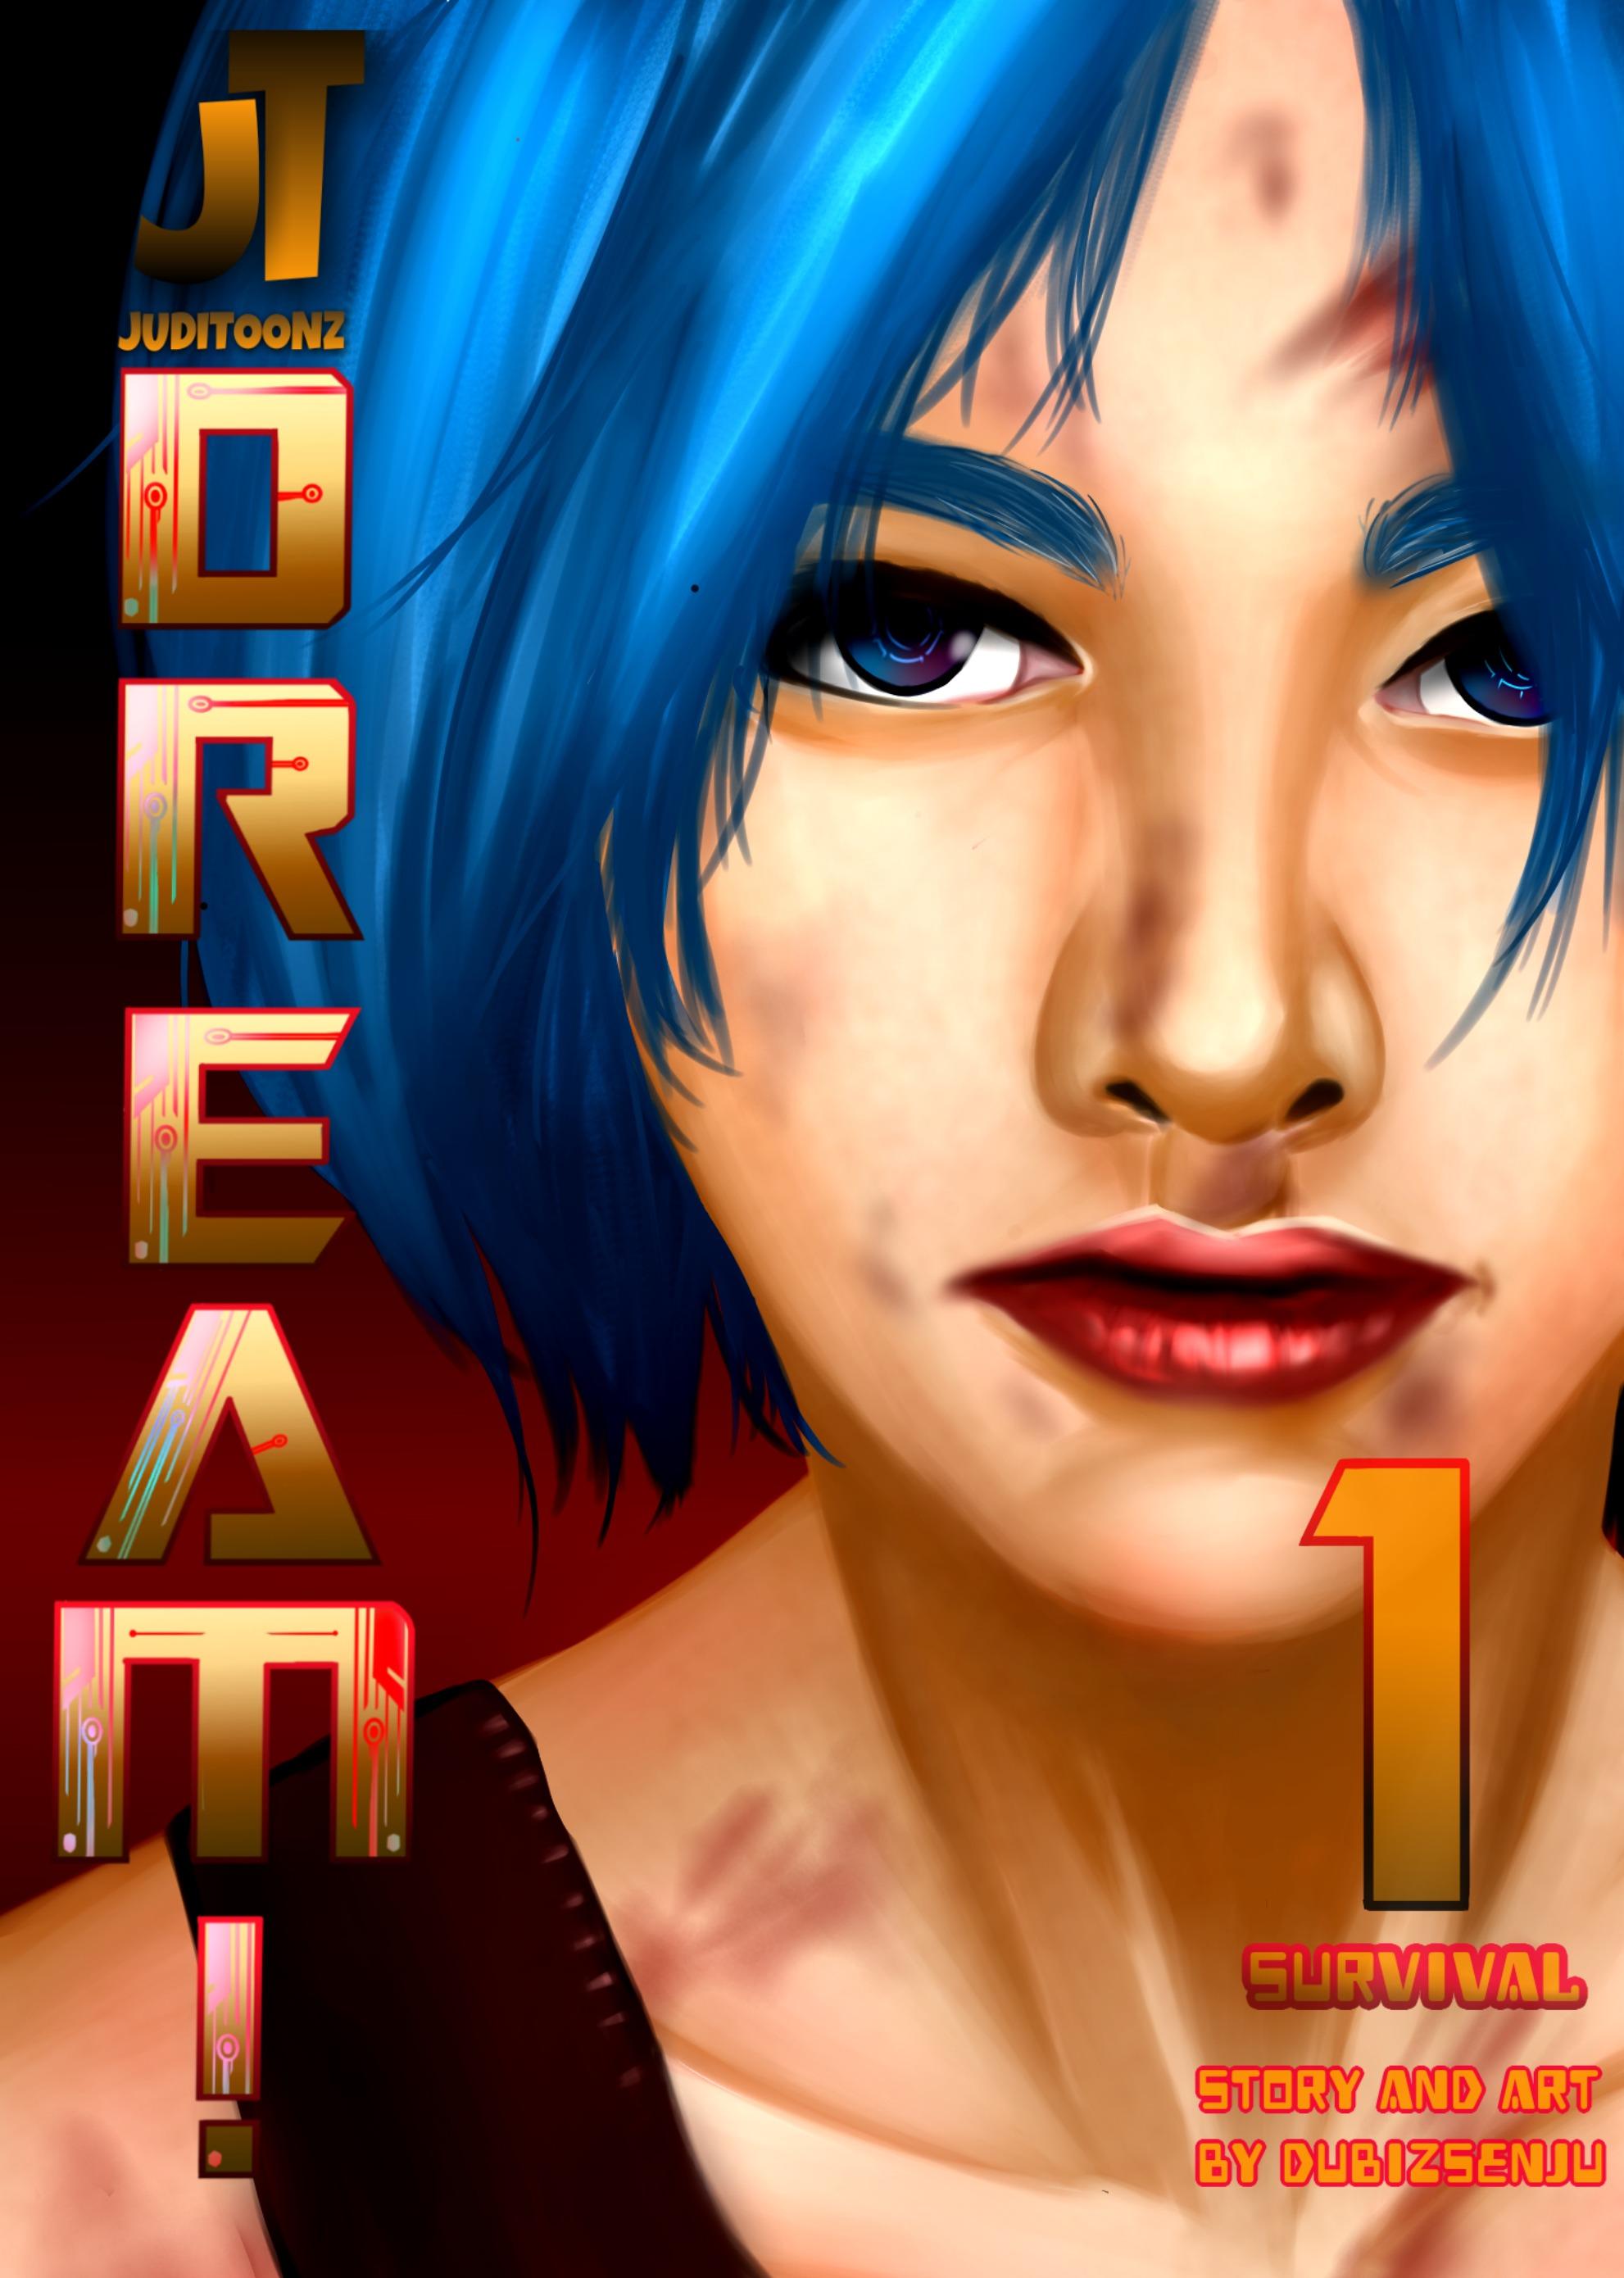 DREAM! #1-SURVIVAL